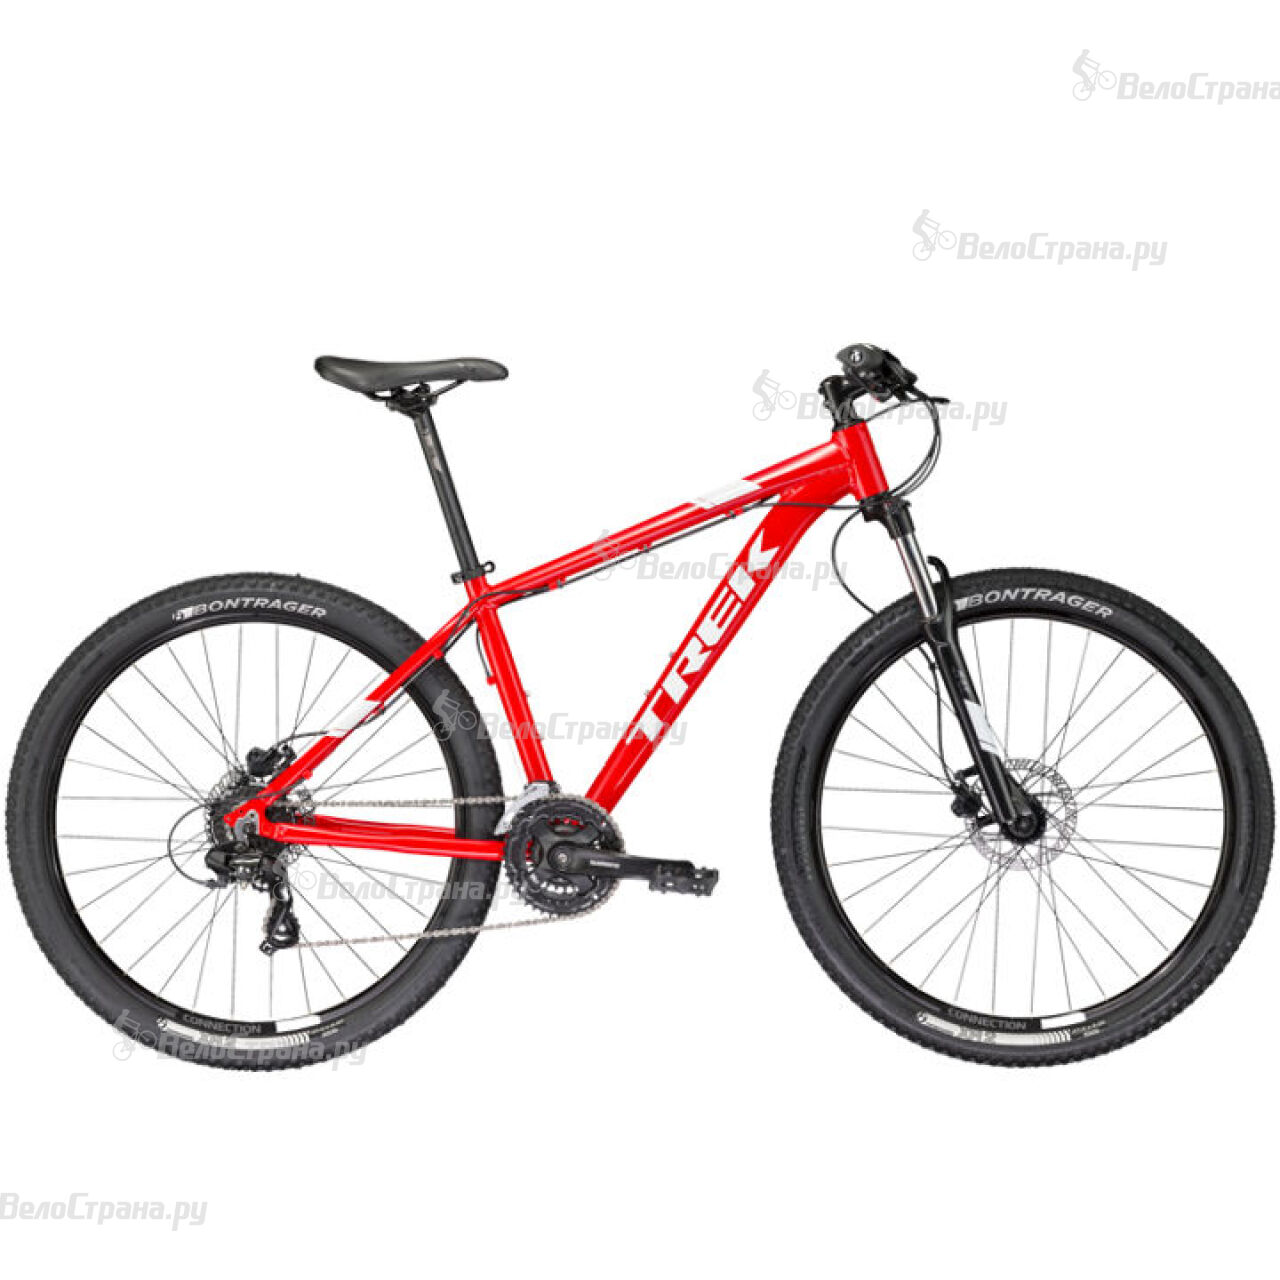 Велосипед Trek Marlin 6 27,5 (2017)